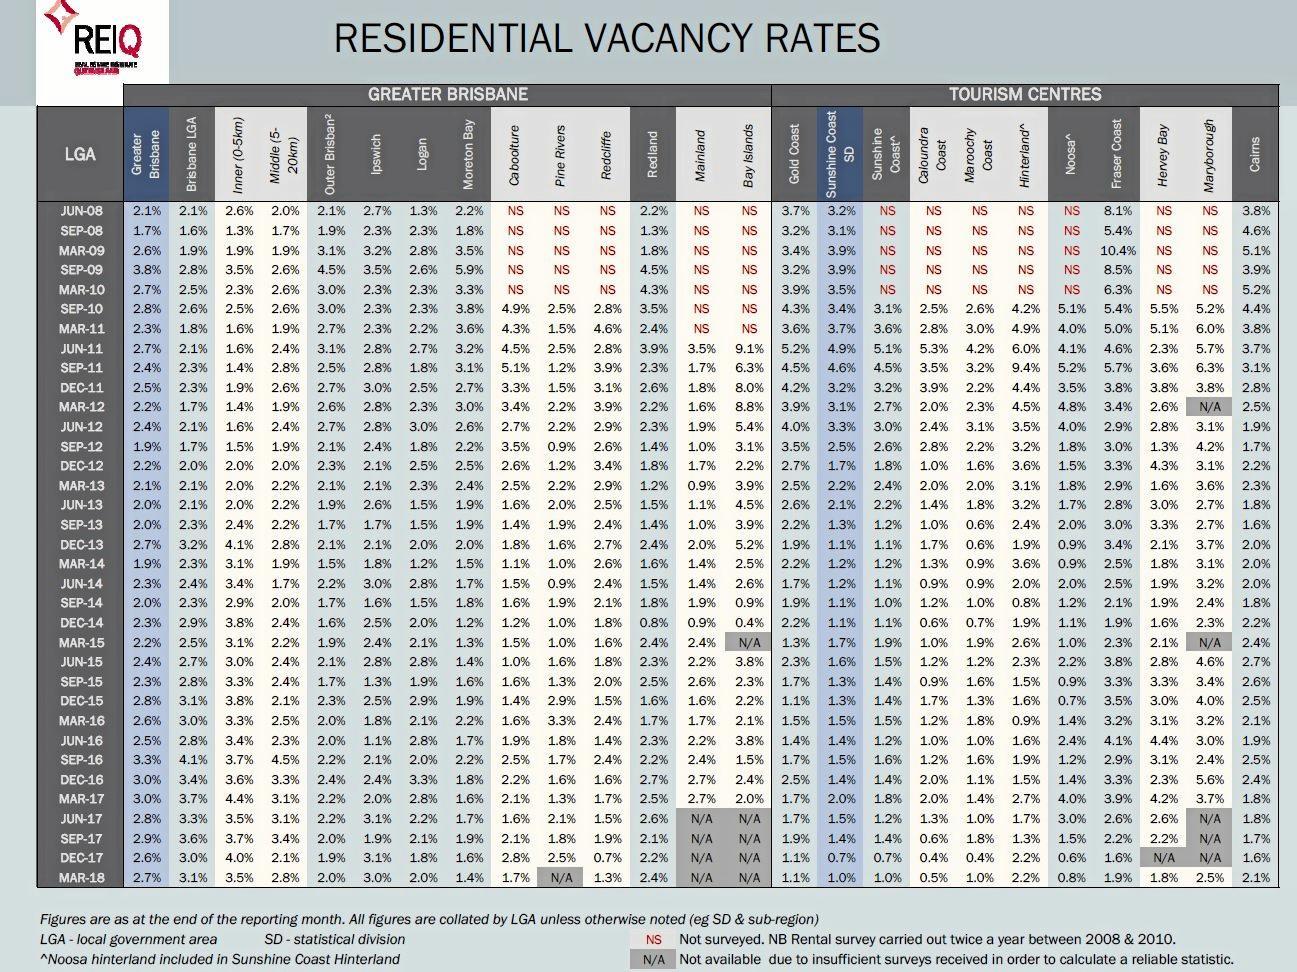 Residential vacancy rates in Queensland